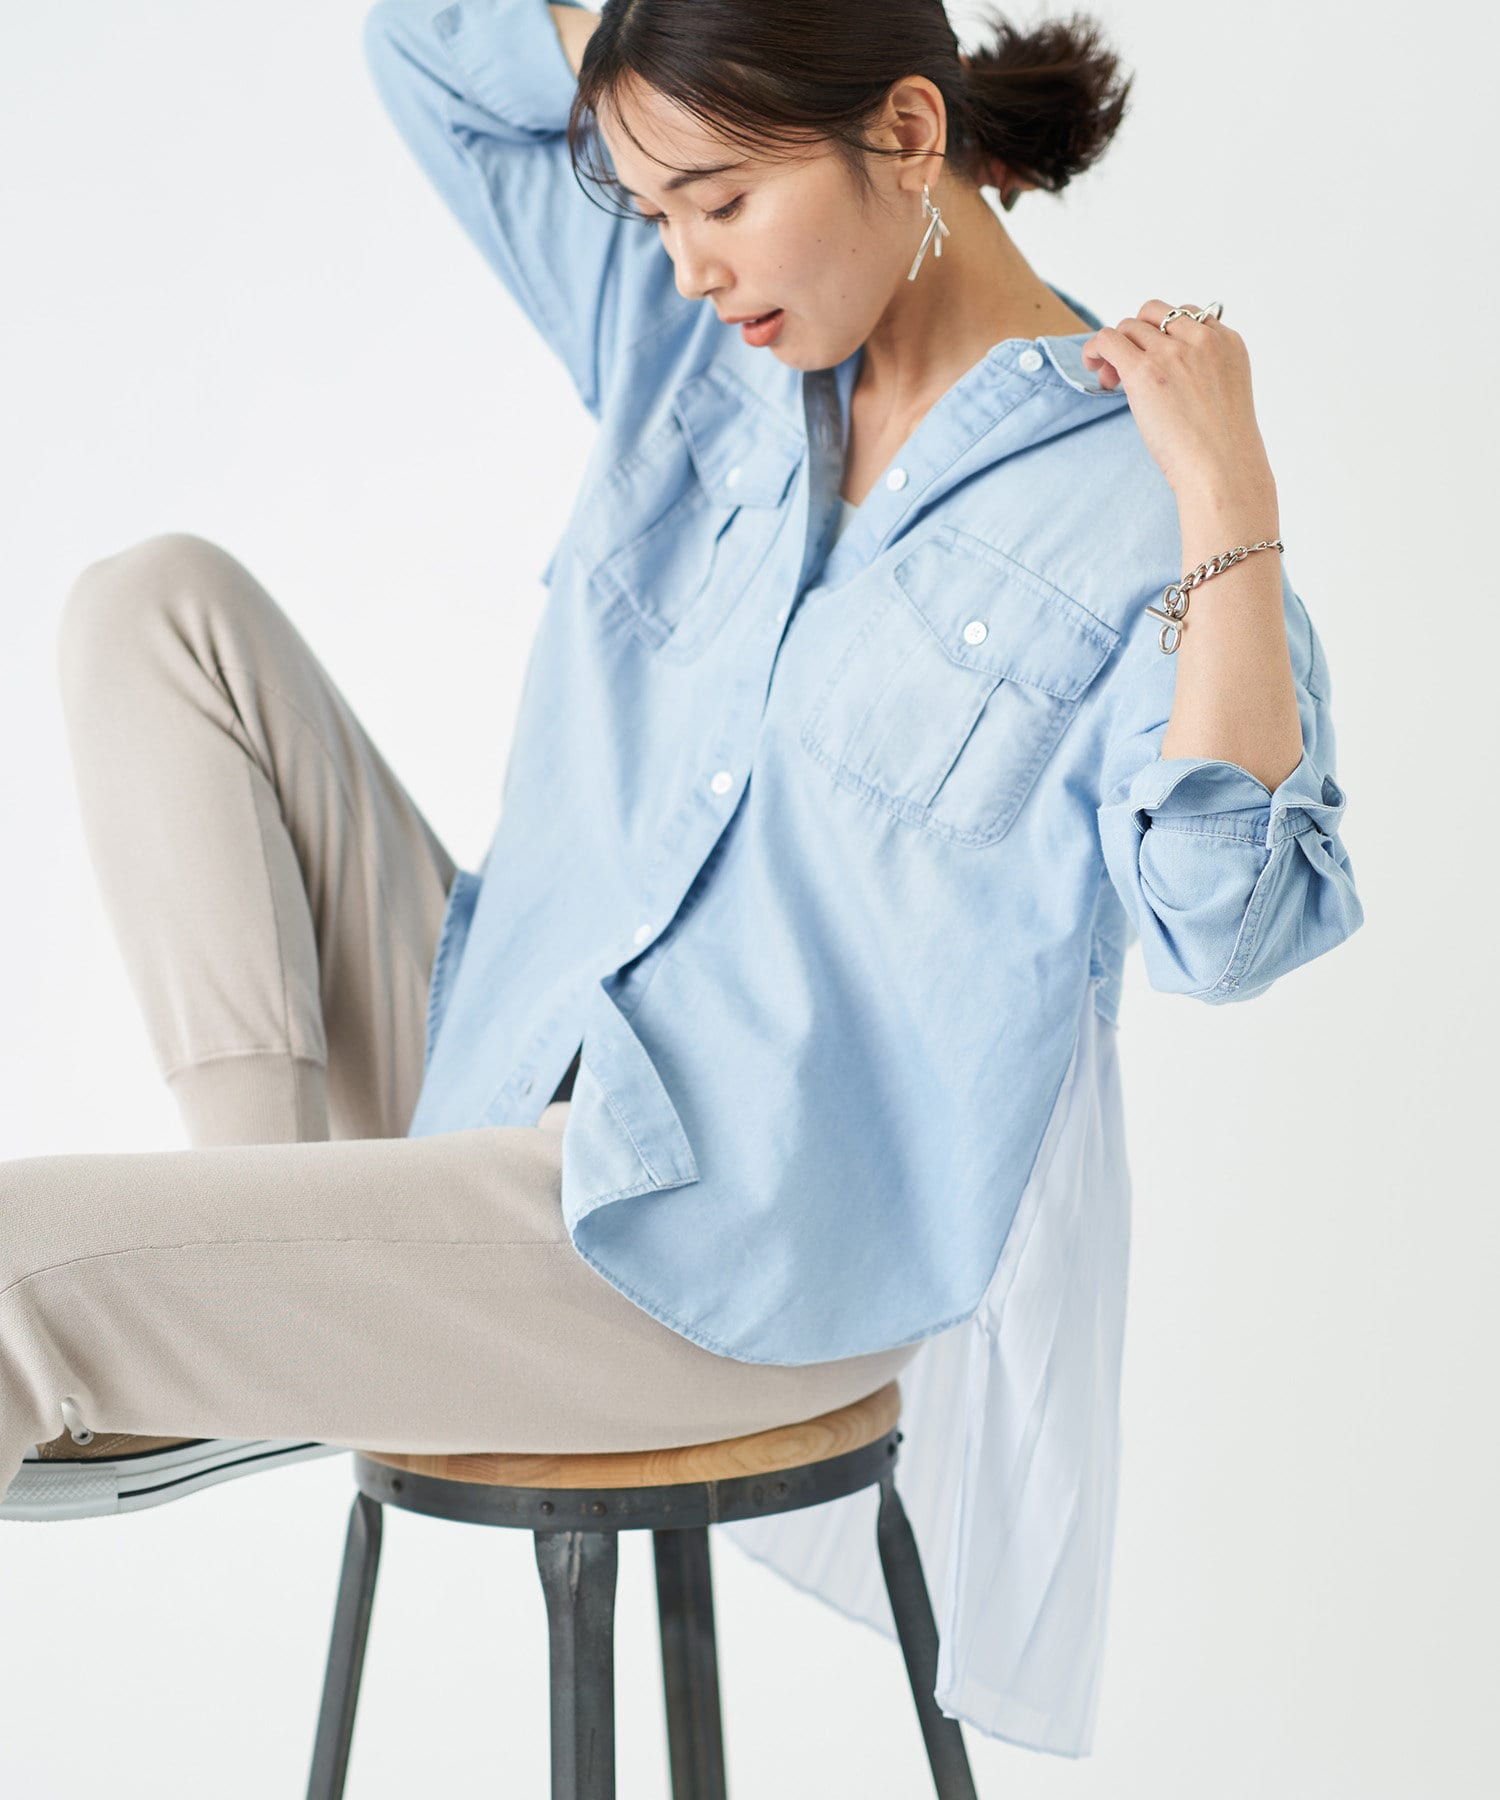 RIVE DROITE(リヴドロワ) 【大好評につき追加生産!】バックプリーツシアーシャツ